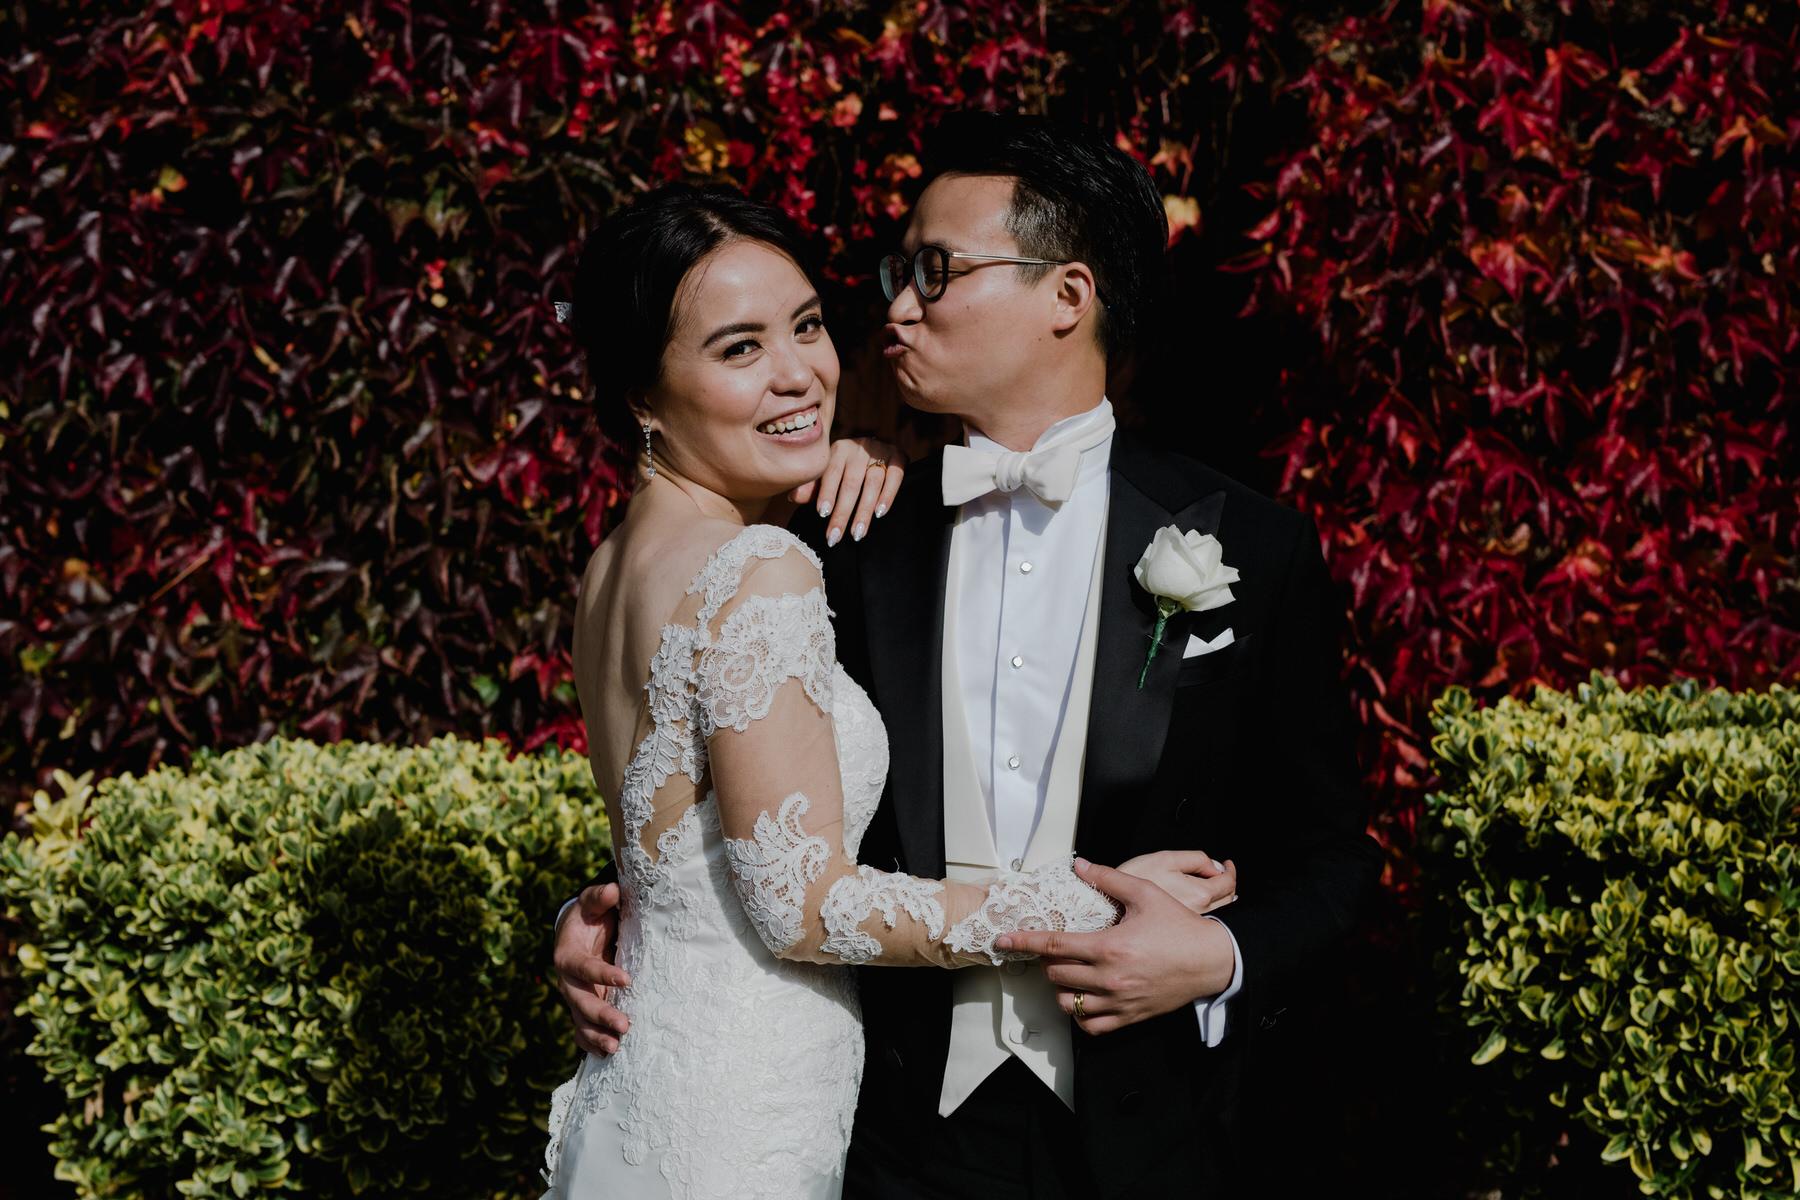 Quirky bride groom red ivy wedding portrait.jpg